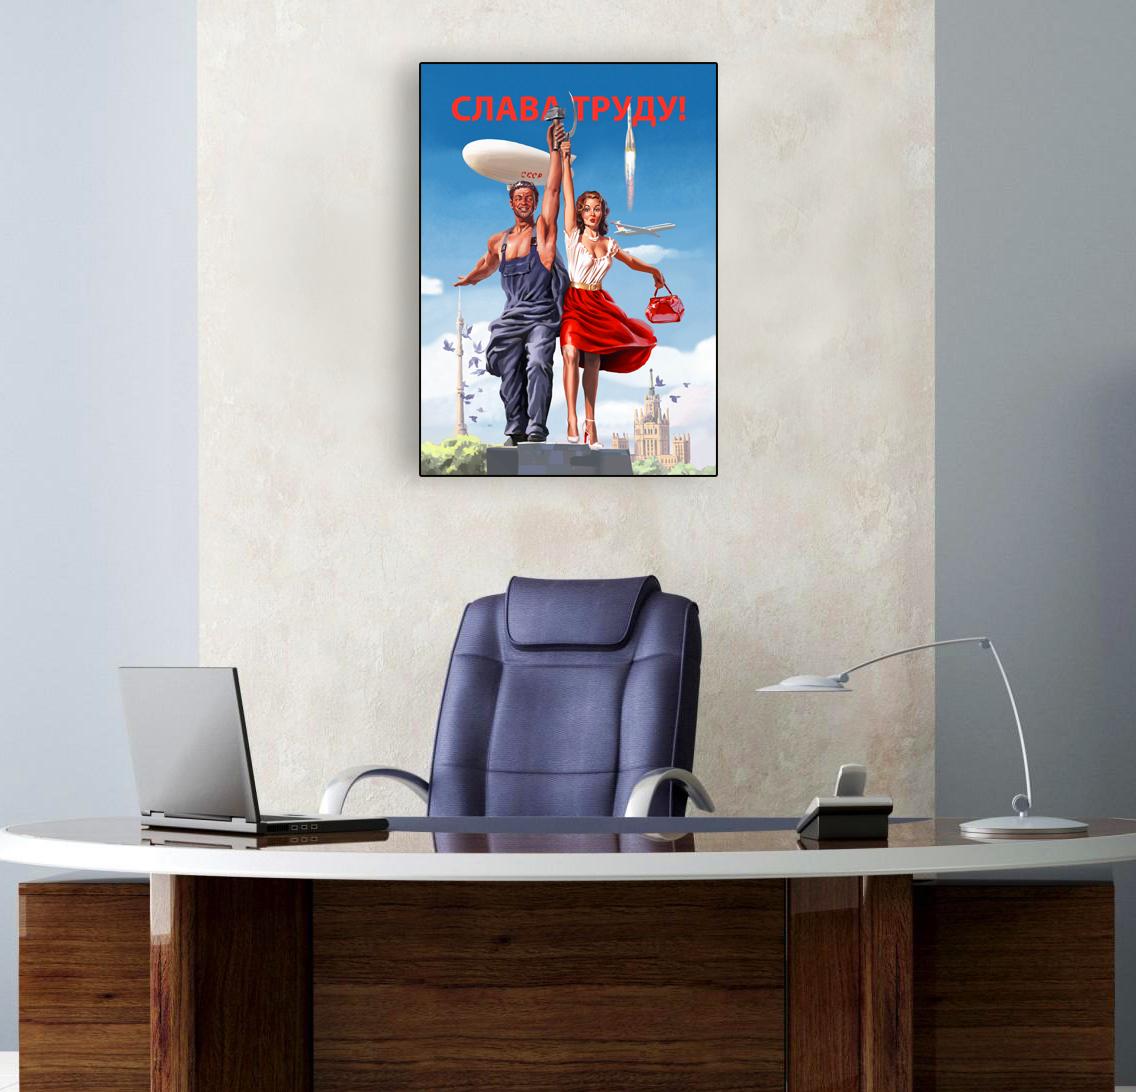 Glory Labor. Valery Barykin. 3D Art Lenticular print (60x90cm/90x135cm/120x180cm). Limited edition (50/100/150).